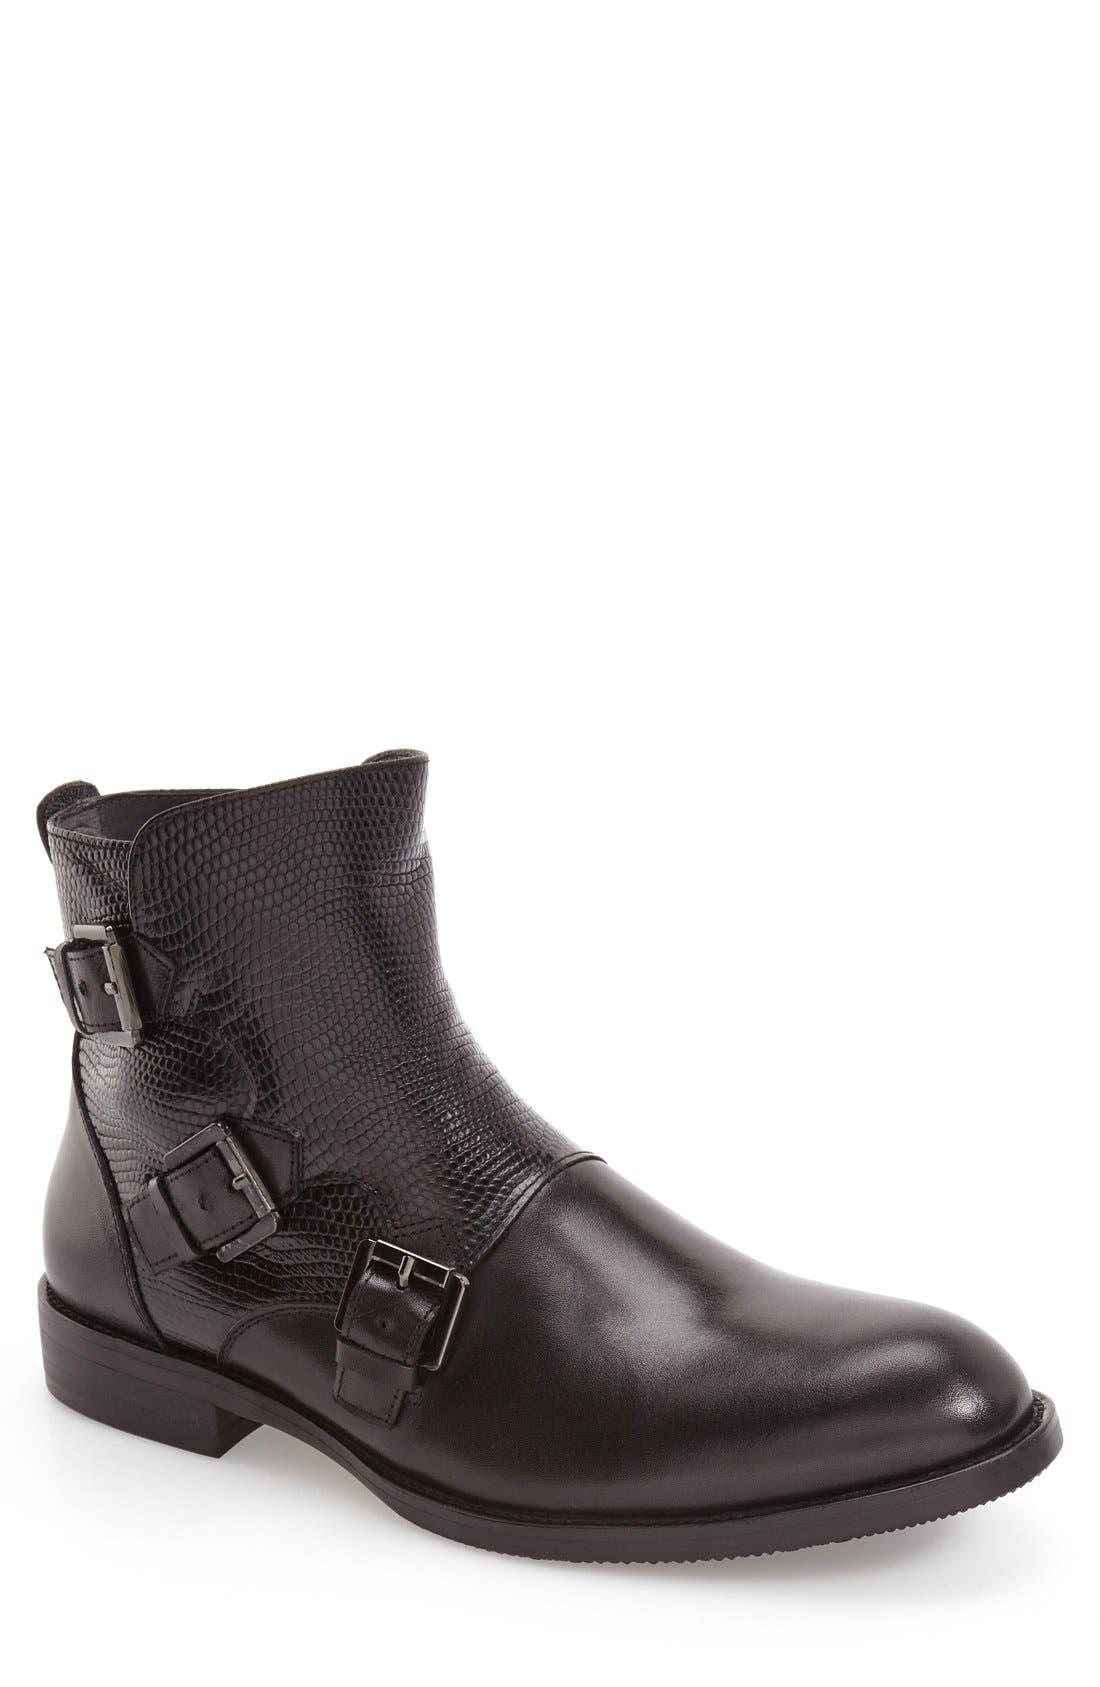 'Messina' Zip Boot,                         Main,                         color,